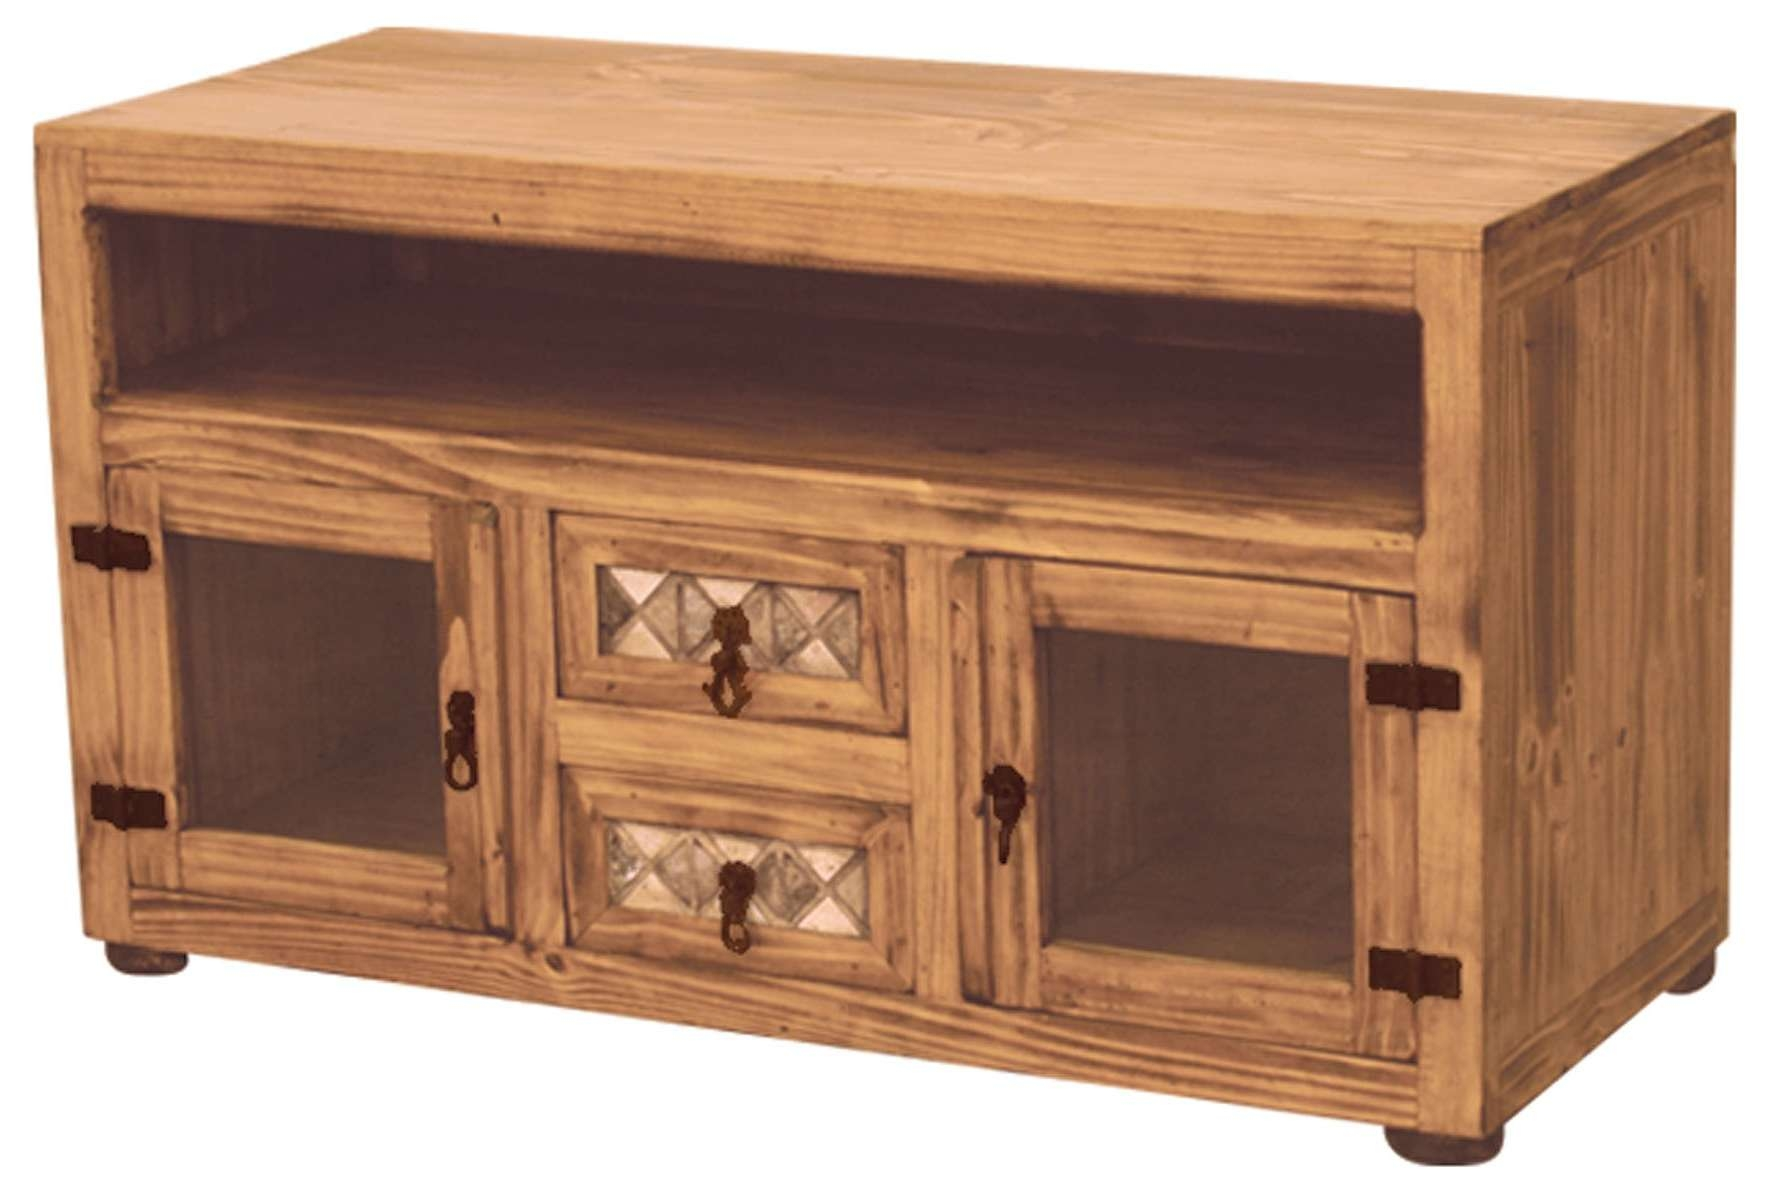 Pine Tv Standorner Stands For Flat Screenspine Plans Dark Regarding Pine Tv Cabinets (View 19 of 20)